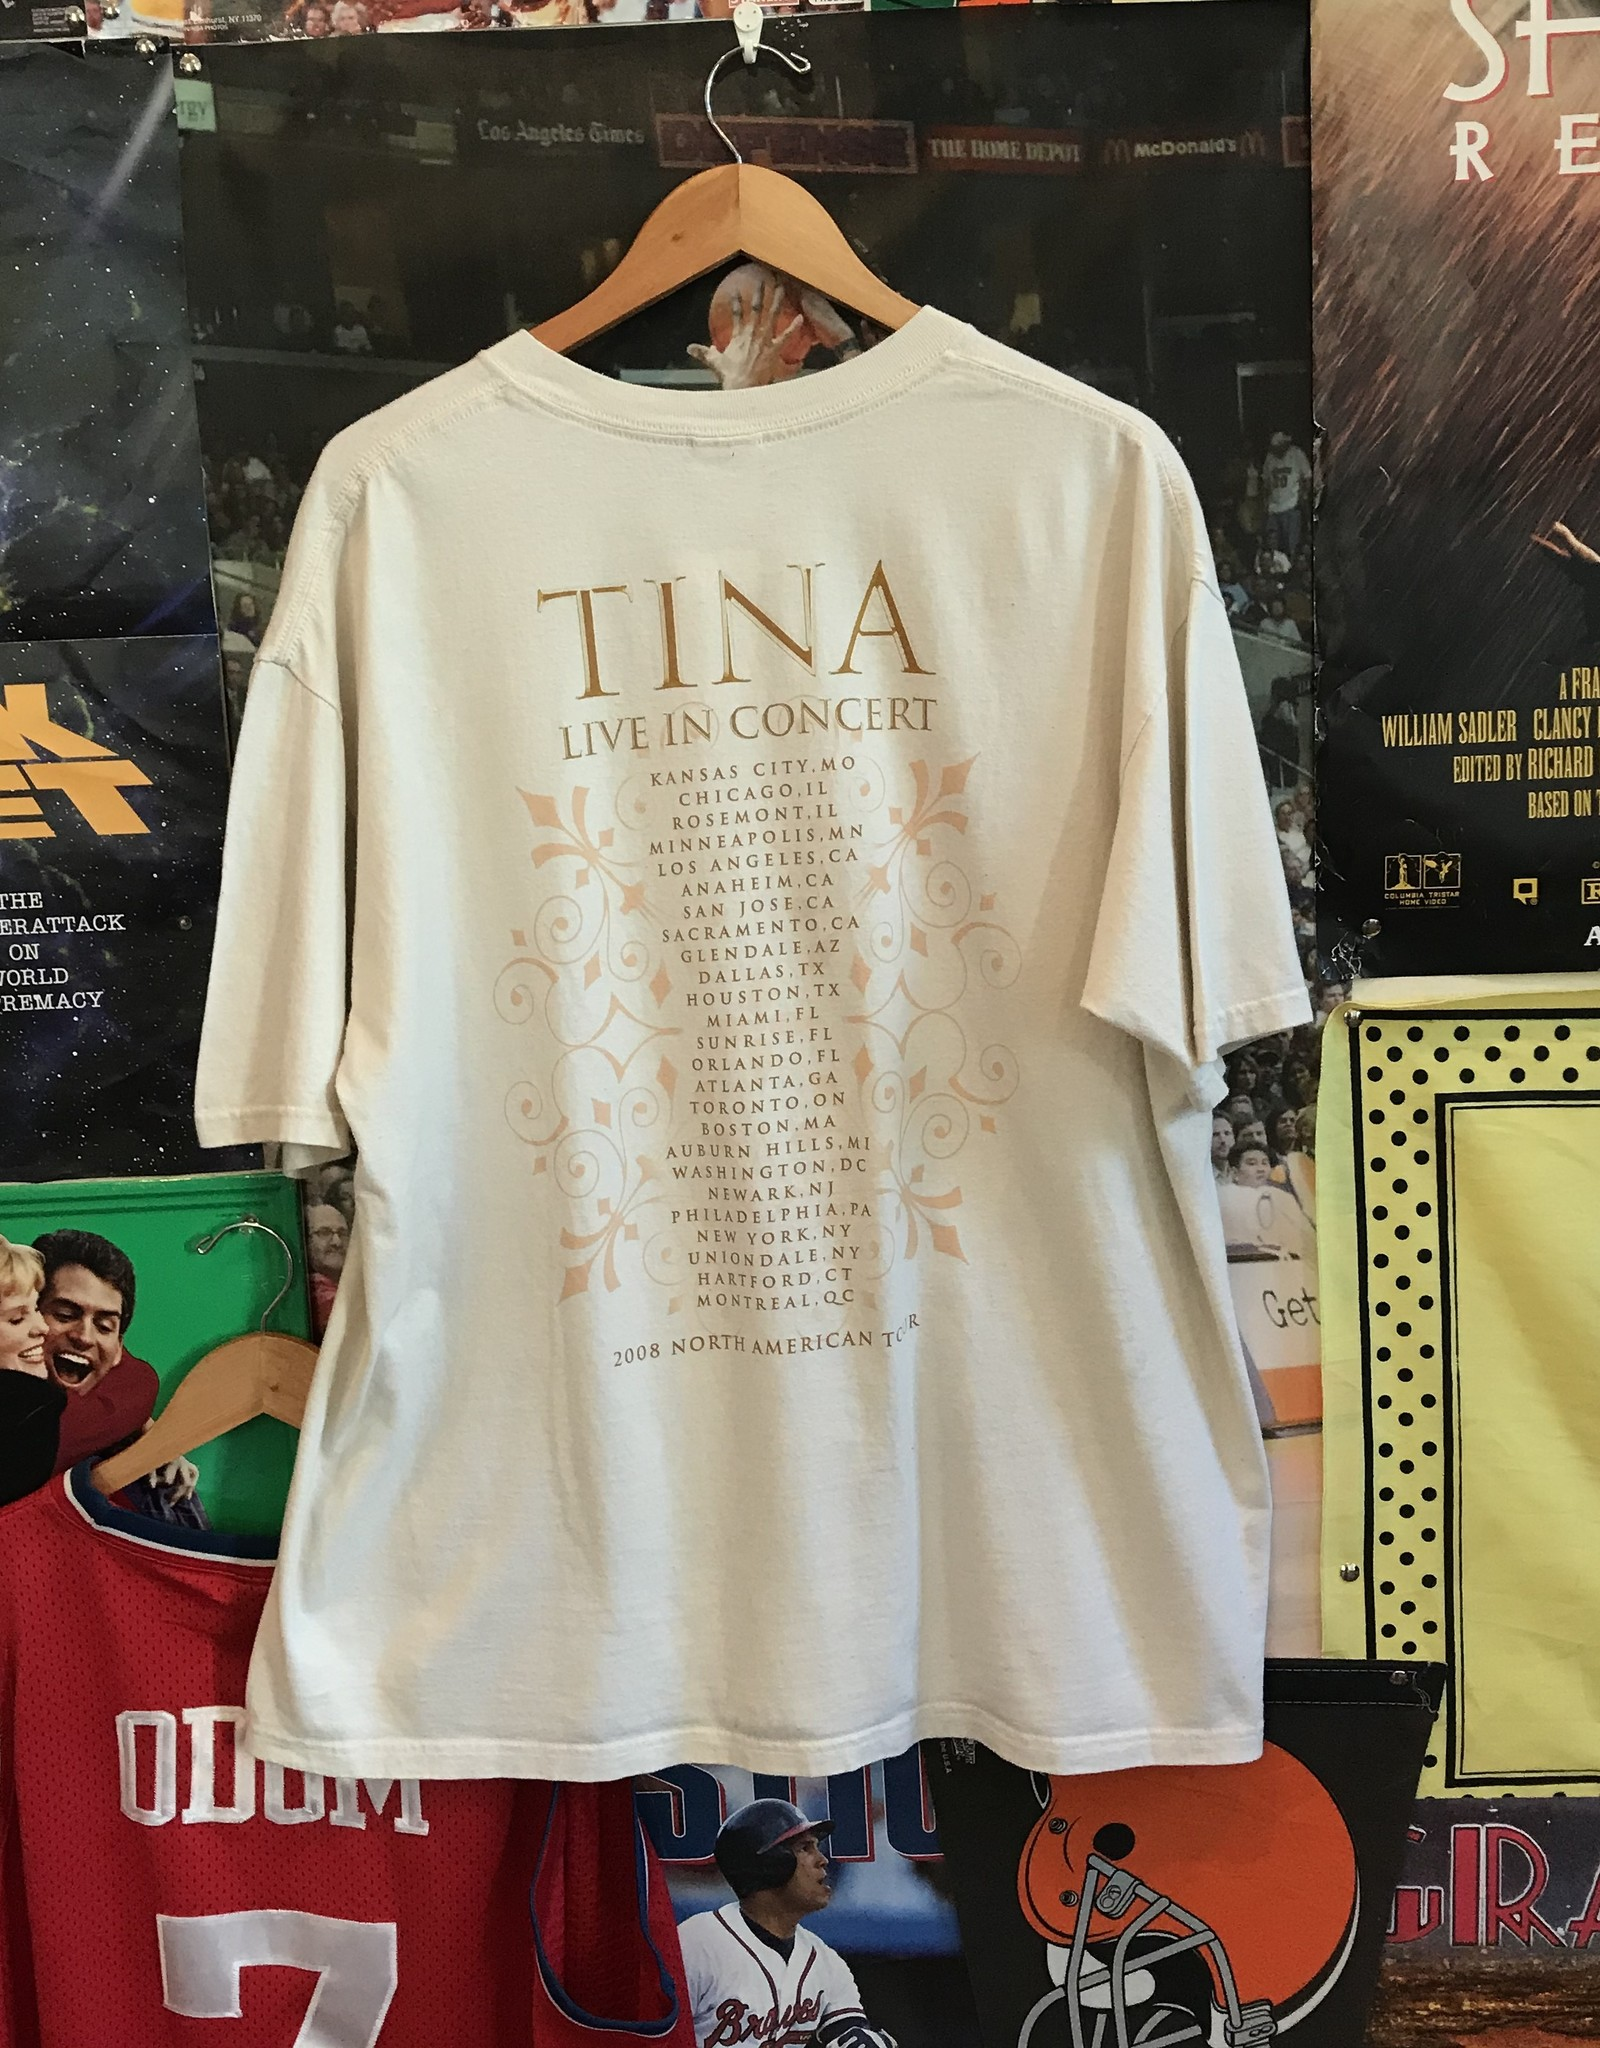 3509tina live in concert tee cream sz XL